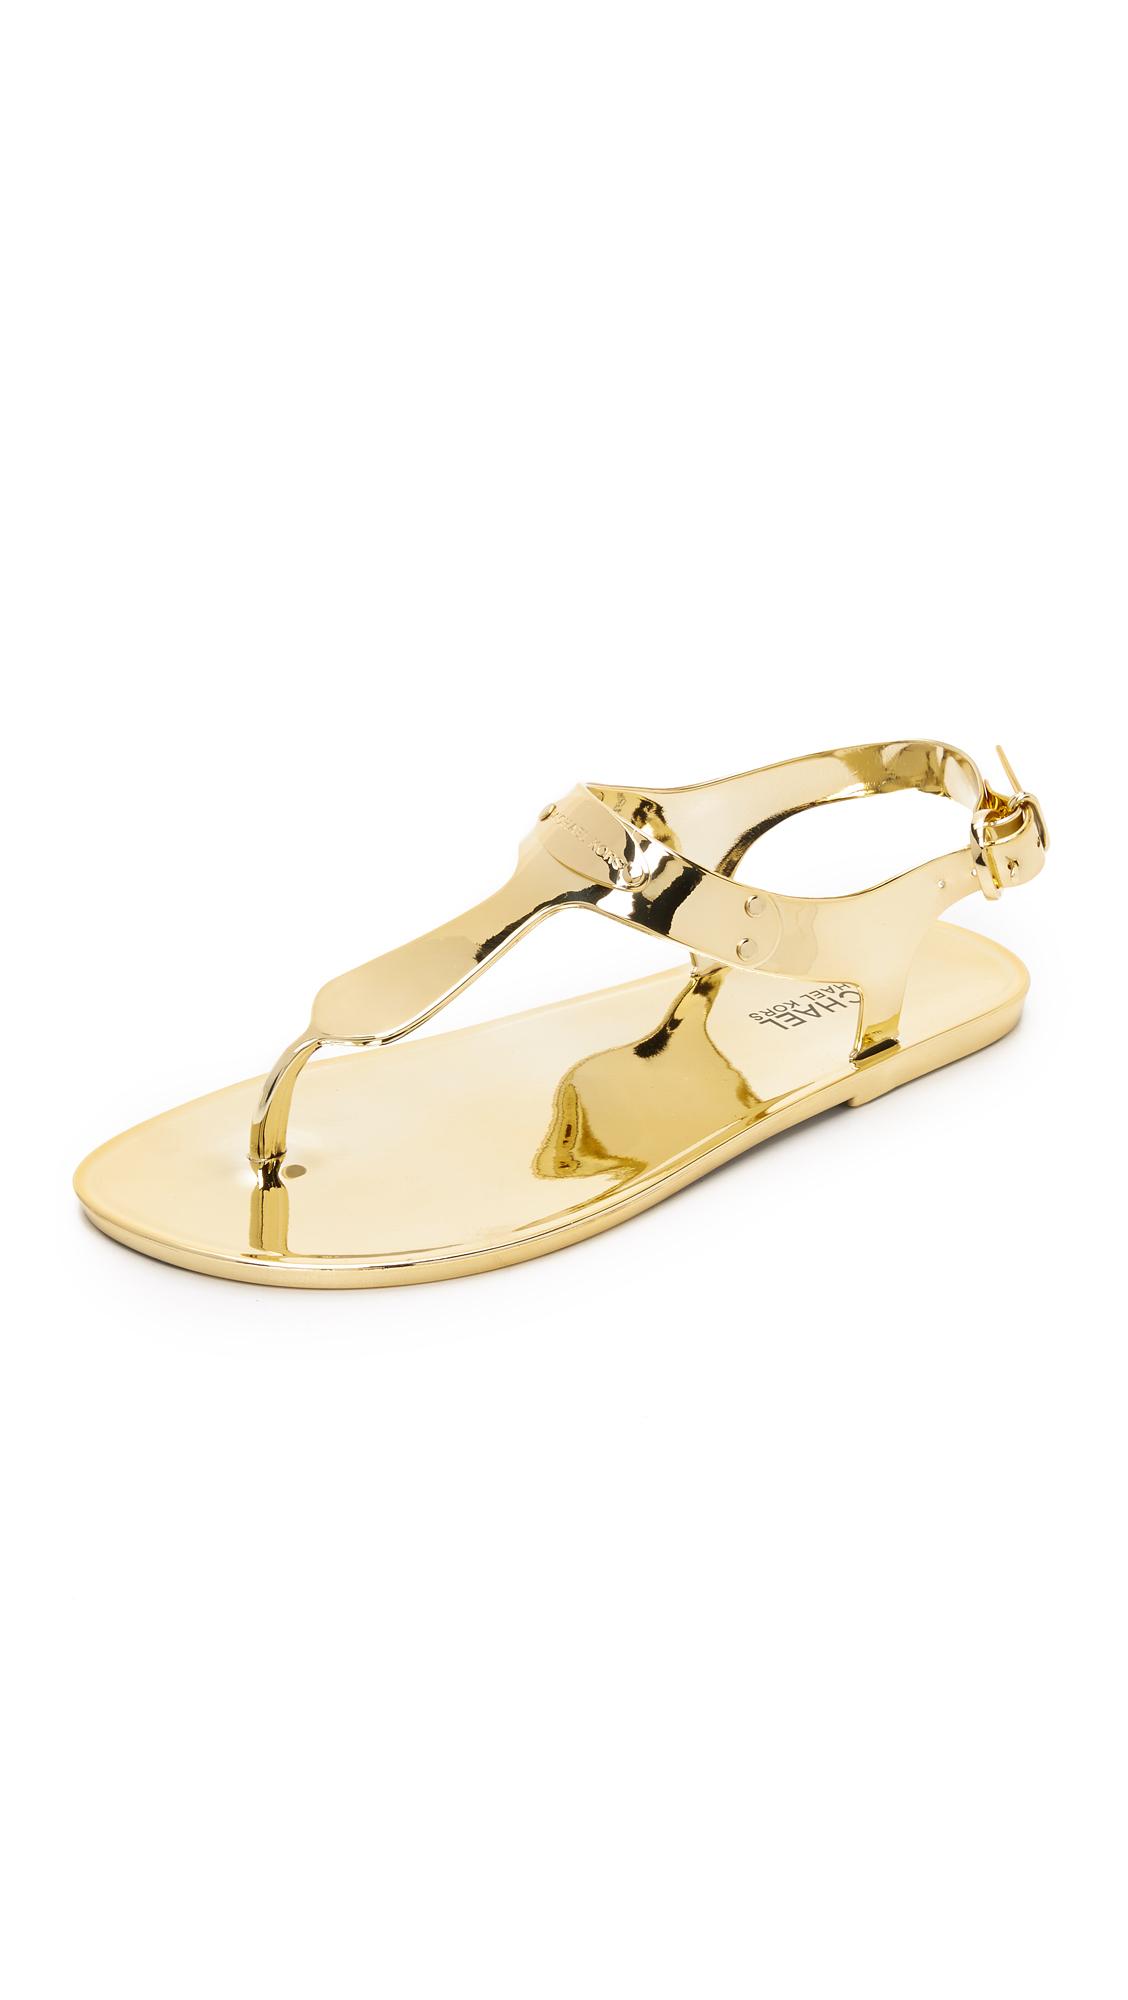 430d806e8cd5c9 Lyst - MICHAEL Michael Kors Mk Plate Jelly Sandals - Gold in Metallic